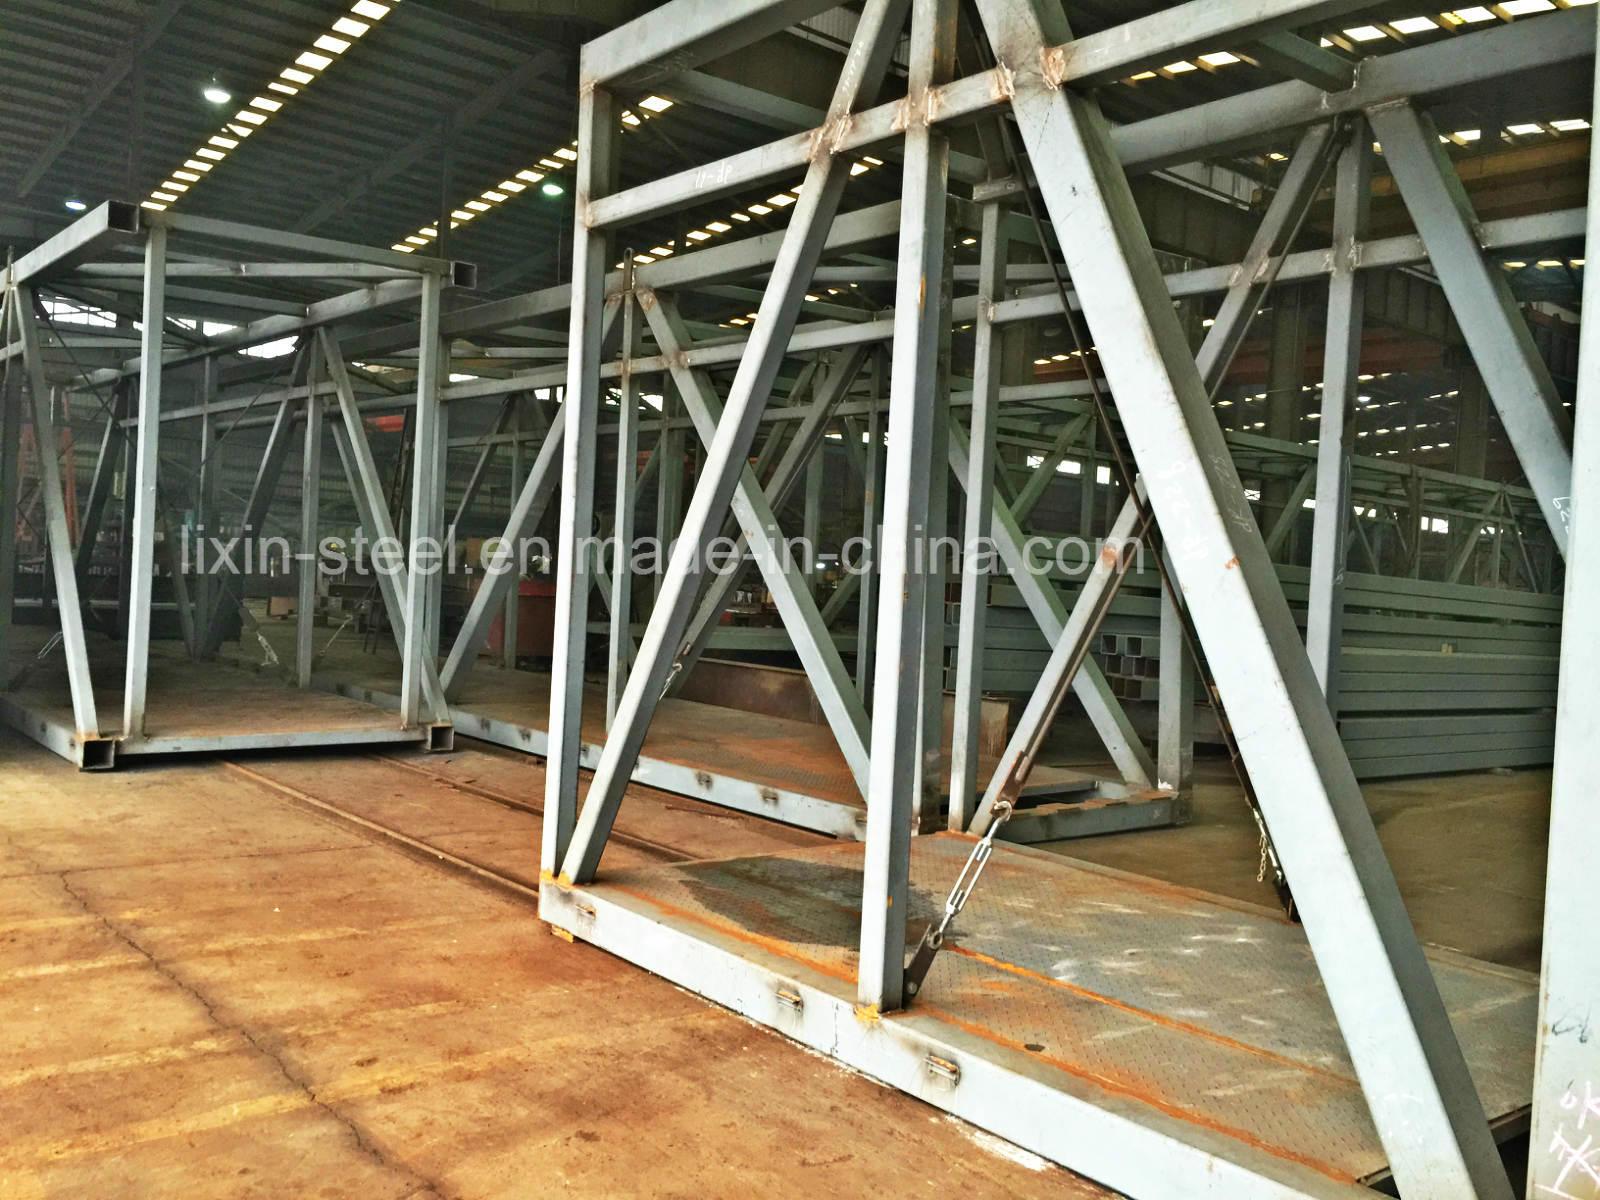 Foto de edificio modular estructura de acero puente a reo - Acero modular precios ...